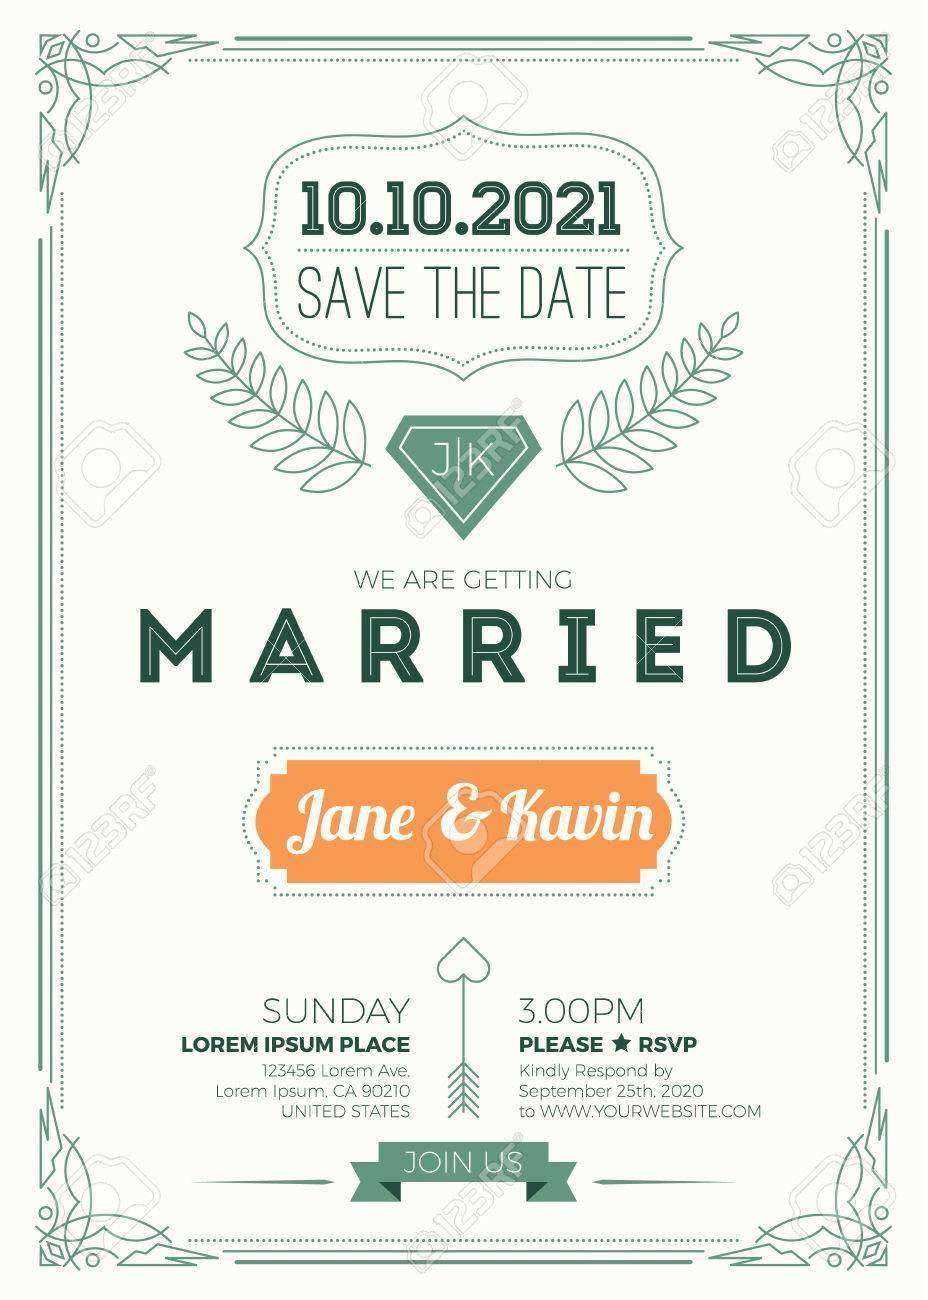 Vintage Wedding Invitation Card A5 Size Frame Layout Print – Invitation Card Size